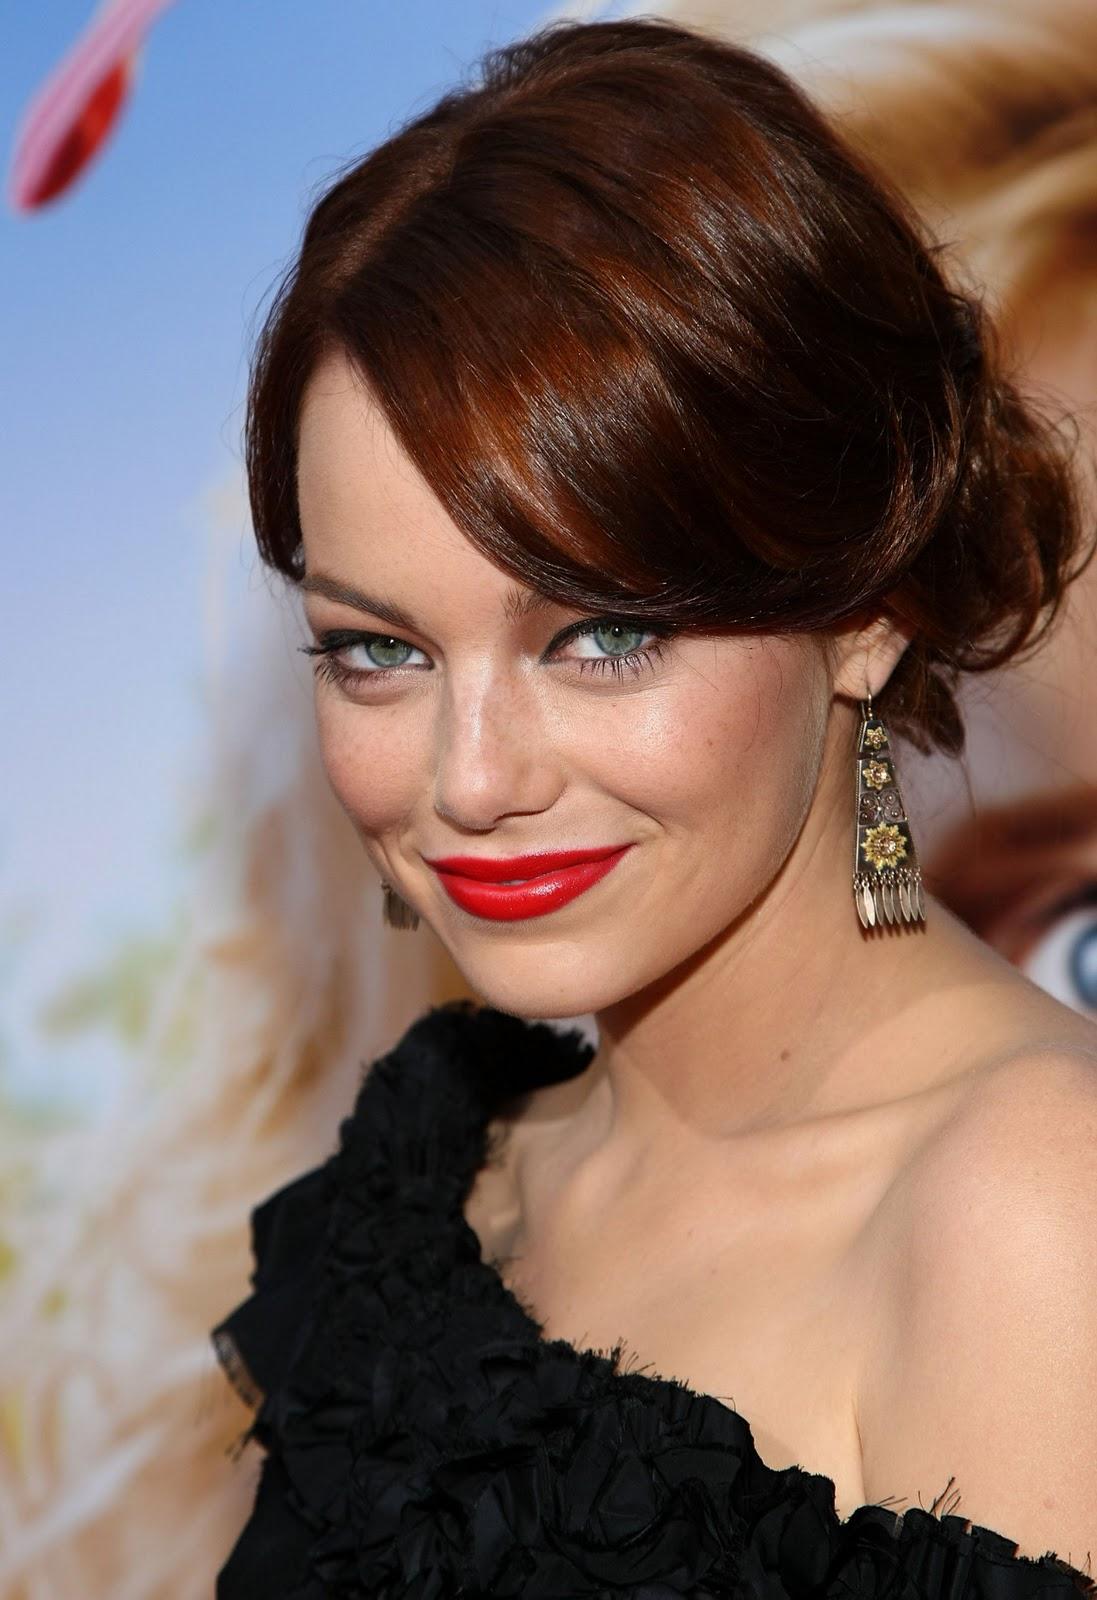 http://1.bp.blogspot.com/--_1SwvDhlWM/TnjTxYxgKeI/AAAAAAAAAFc/LdTAGm_Gh-Q/s1600/emma-stone-red-carpet-pretty-dress-bright-red-lipstick.jpg